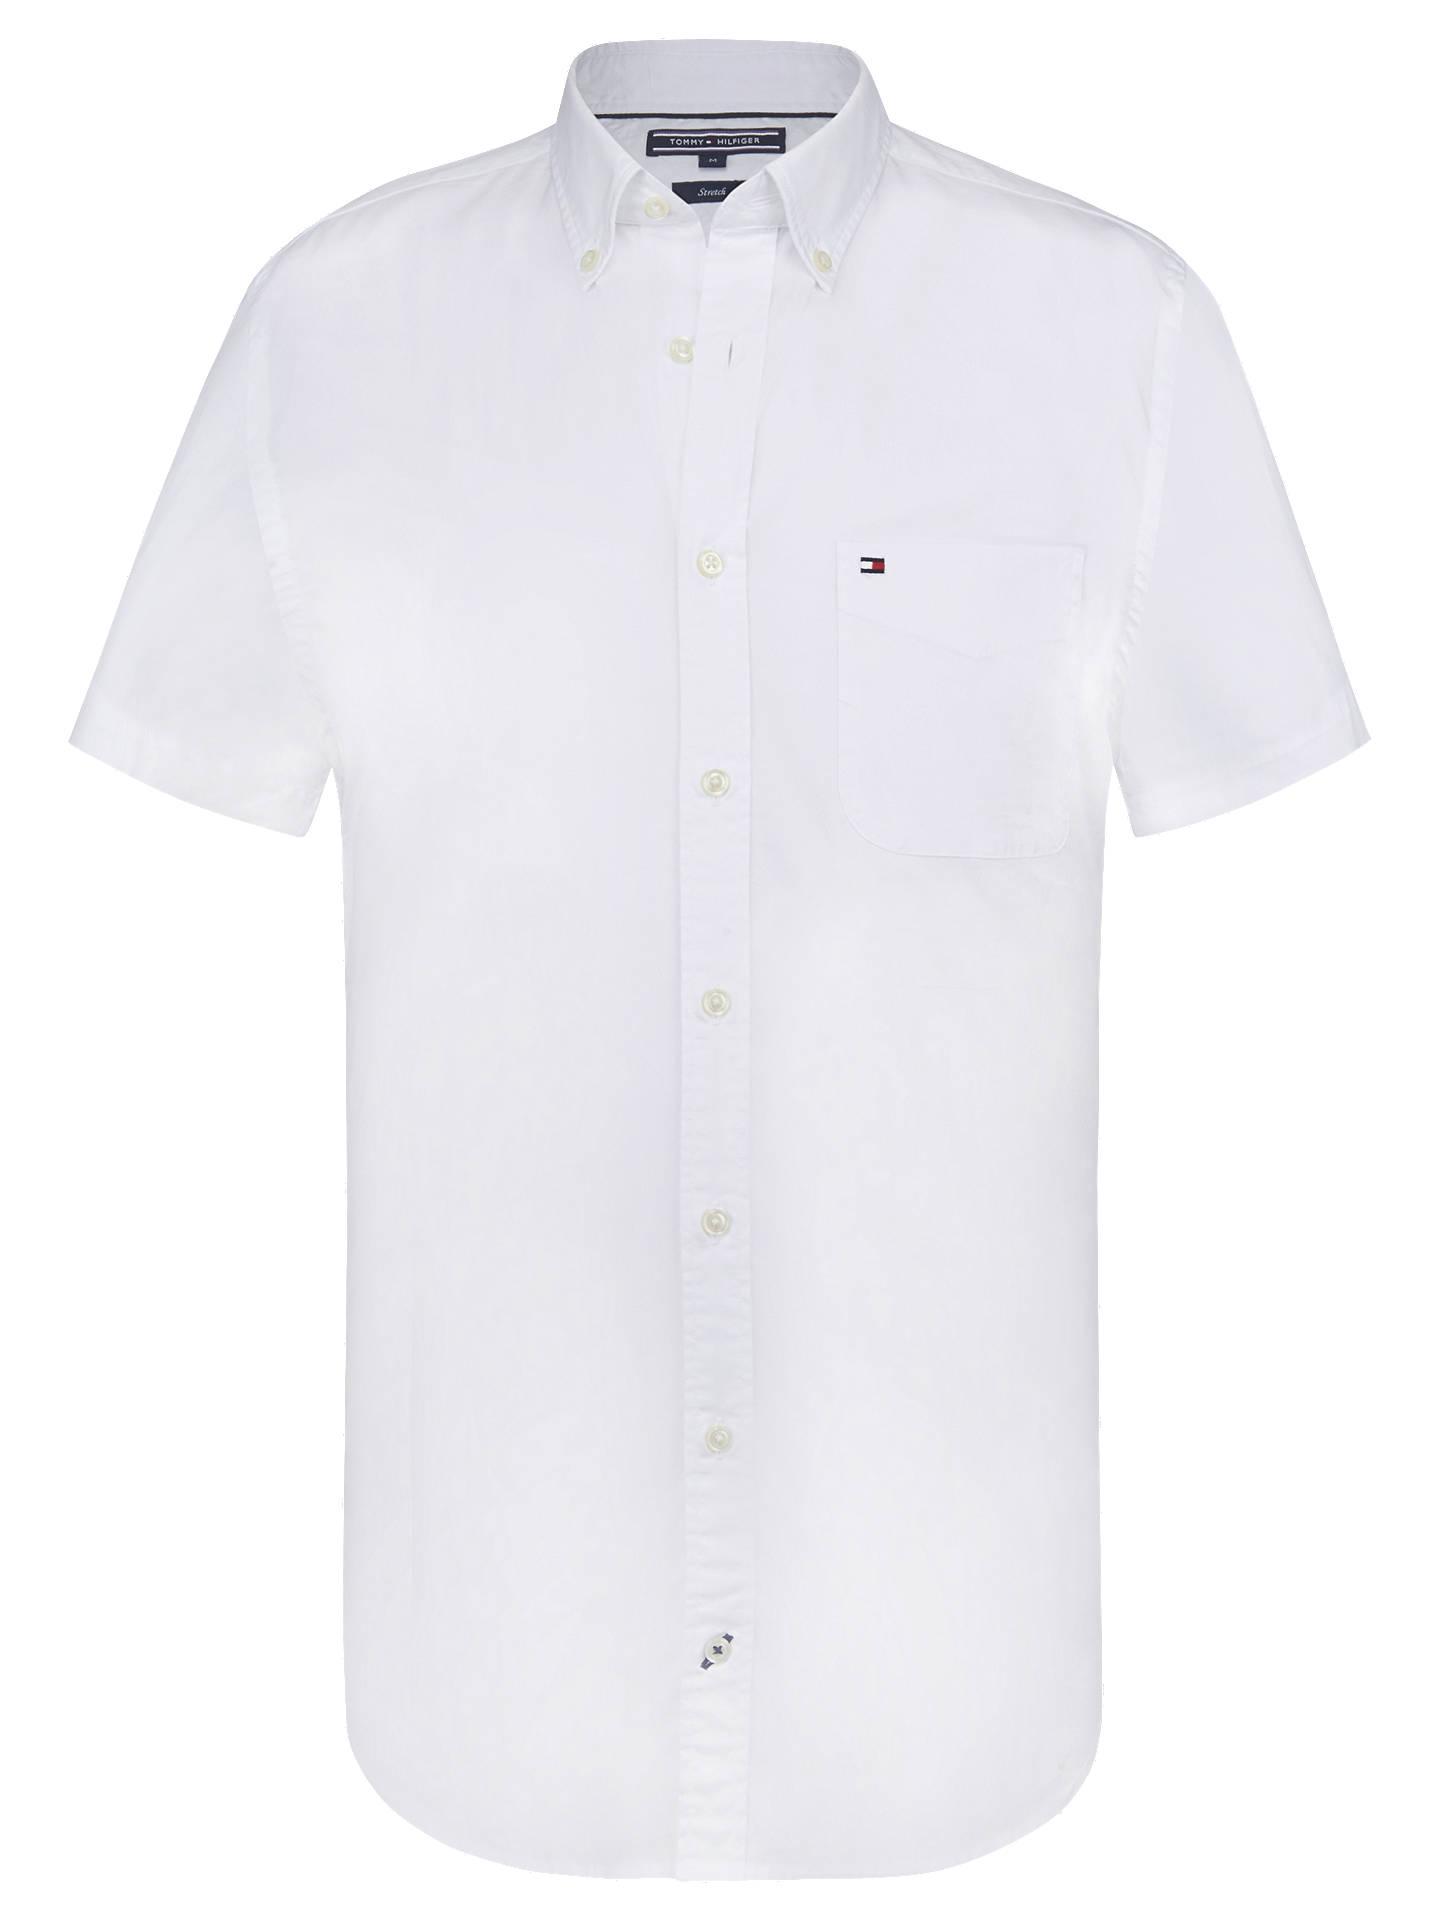 760c6c7c5 Buy Tommy Hilfiger Stretch Poplin Short Sleeve Shirt, Bright White, S  Online at johnlewis ...